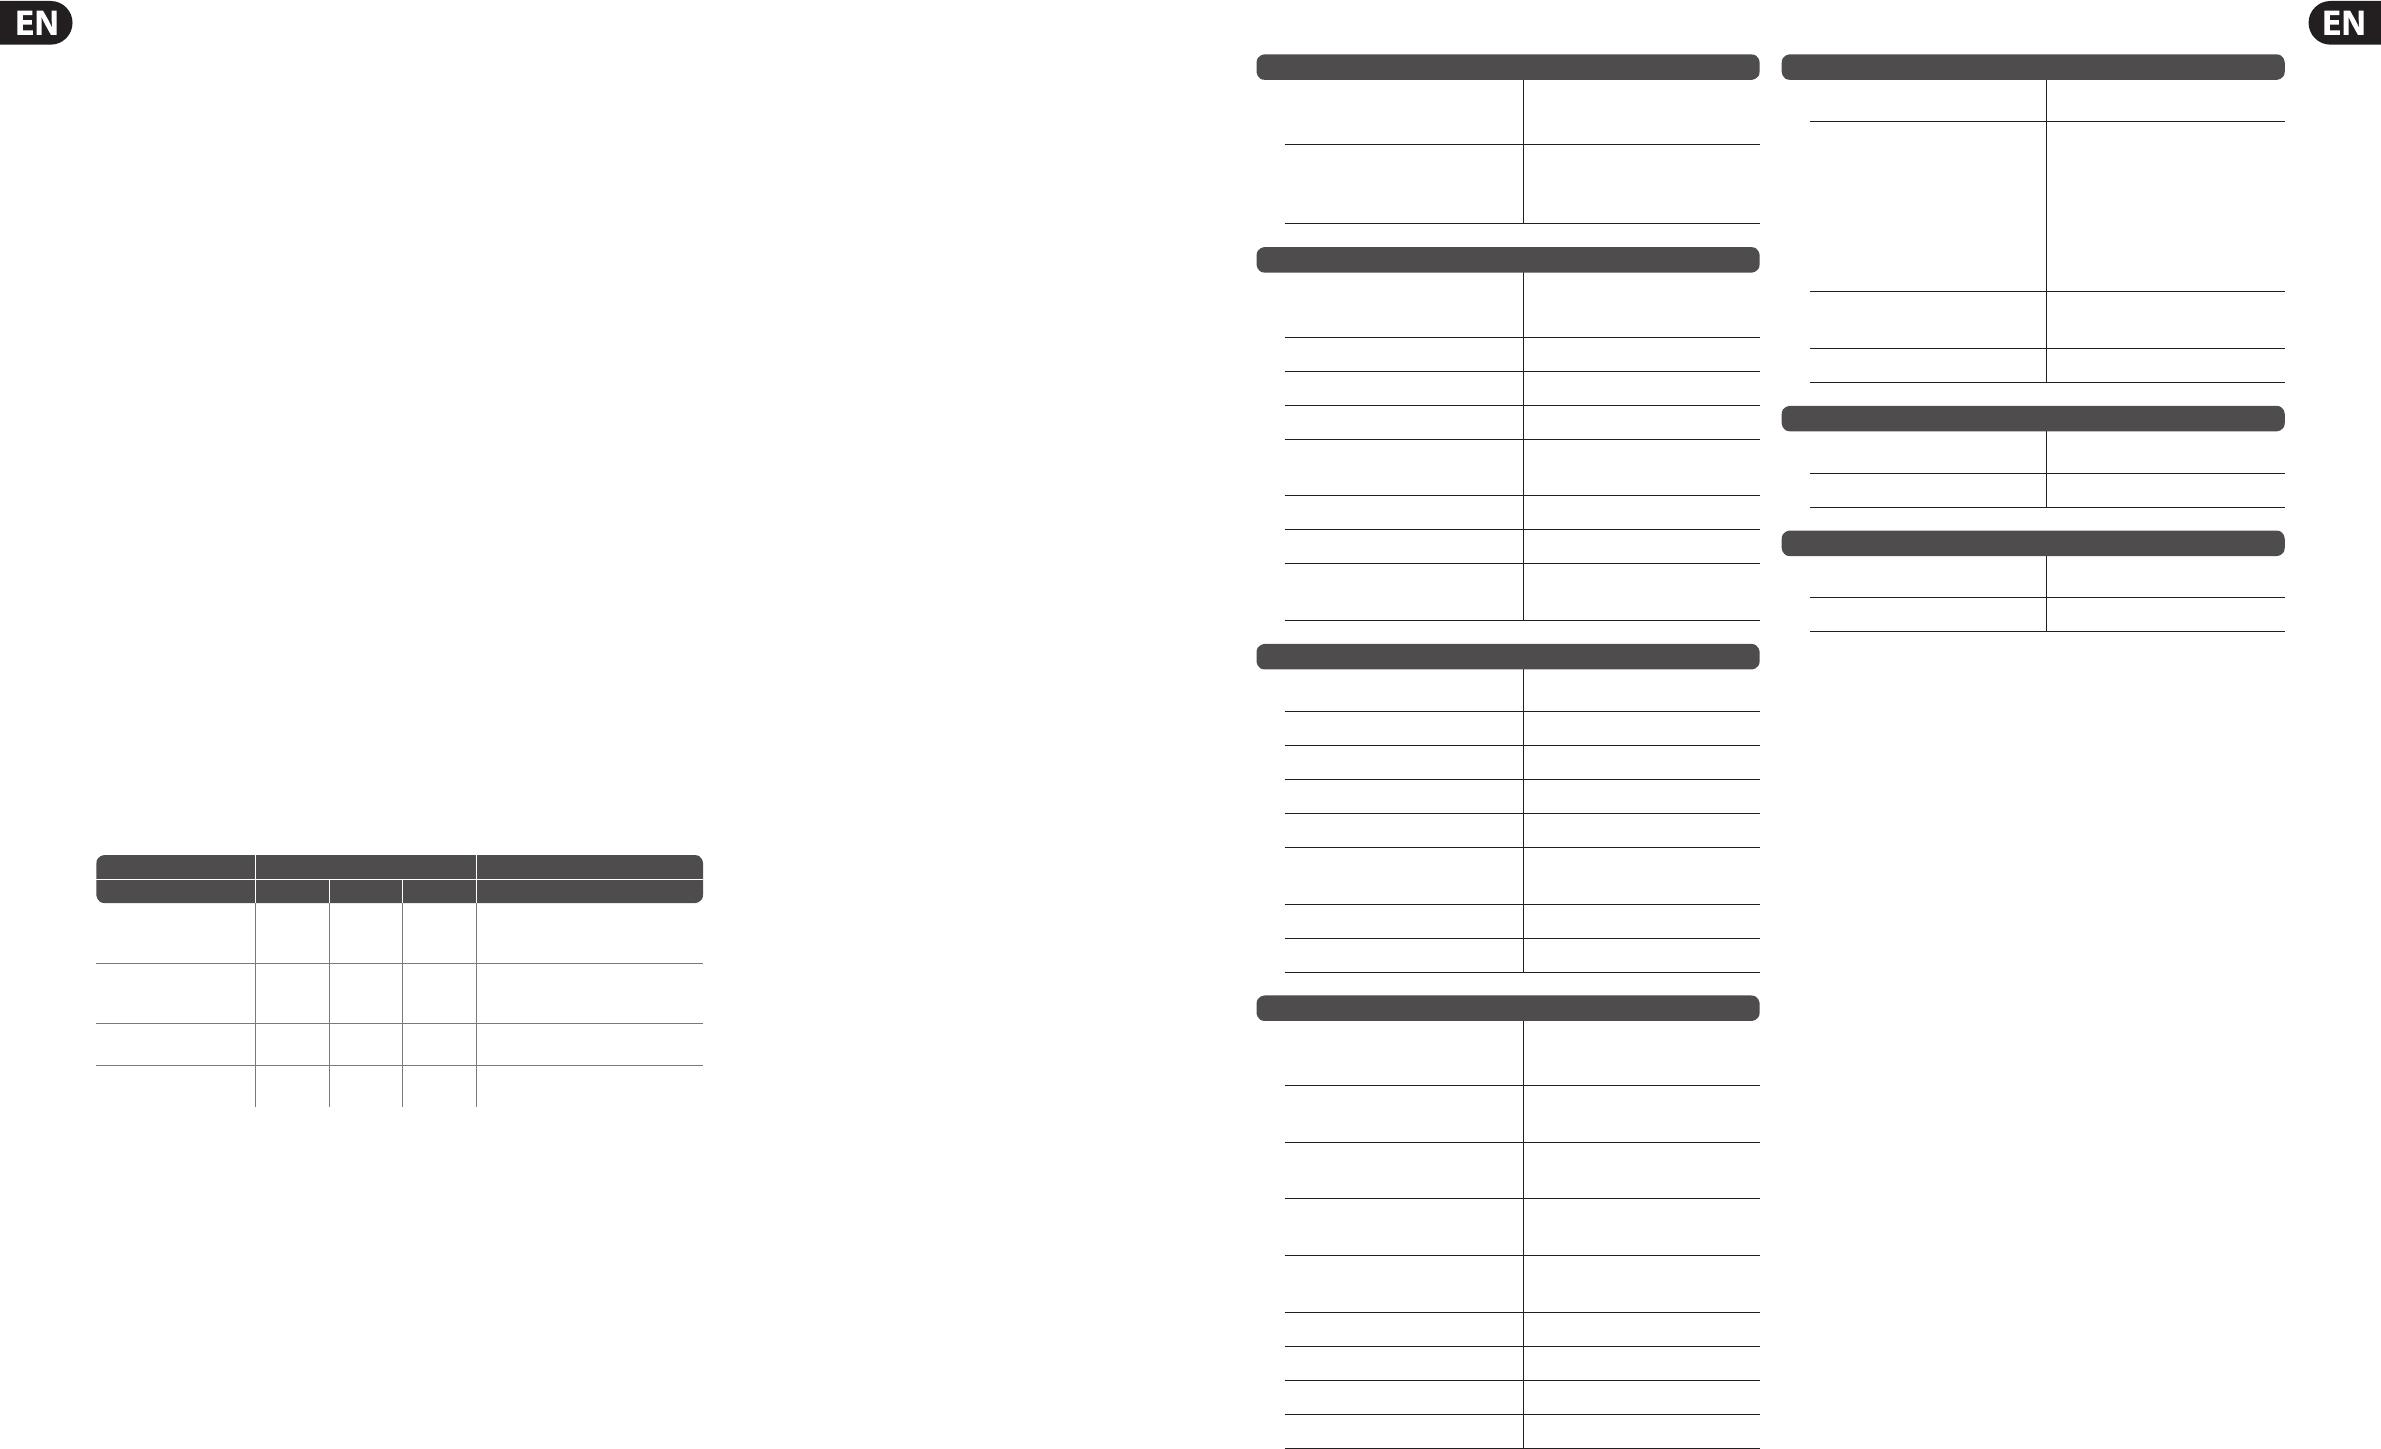 Behringer S16 Users Manual DIGITAL SNAKE